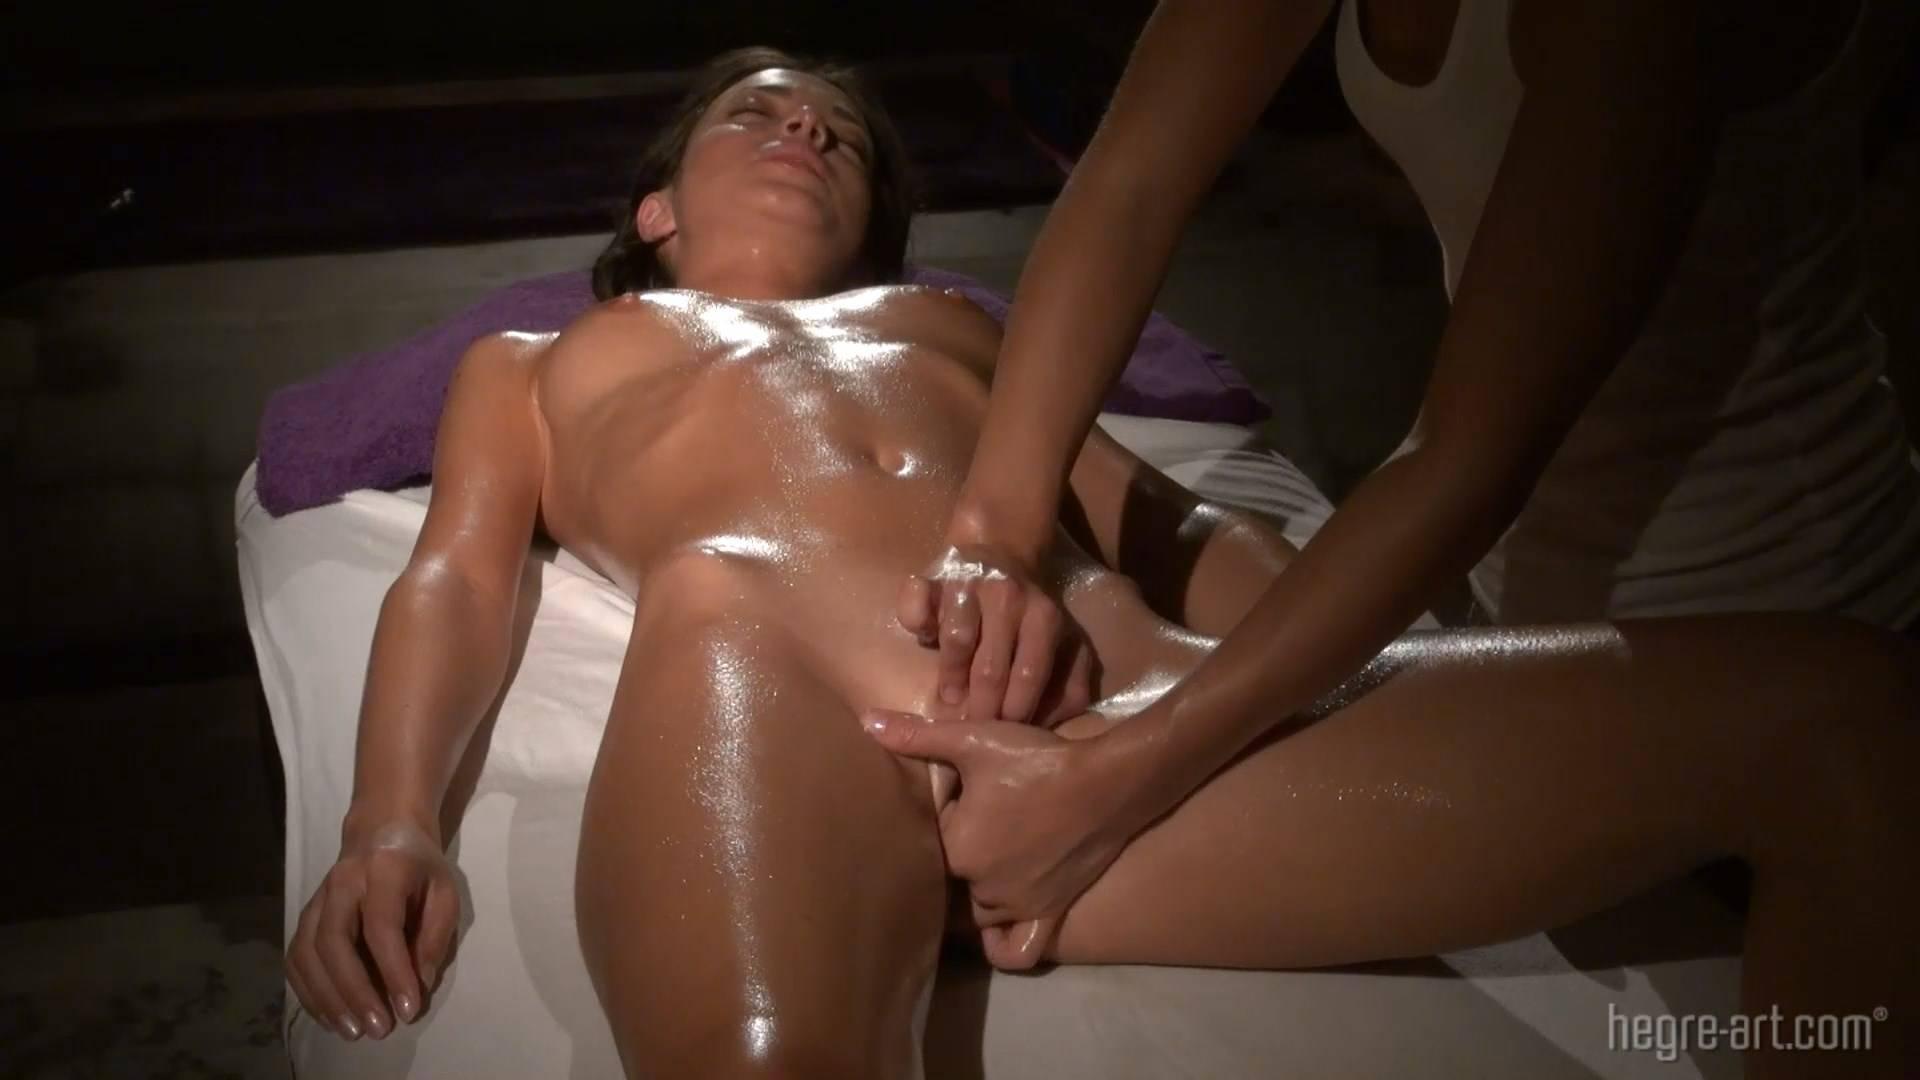 Screaming Anal Enema Massage - Hegrecom